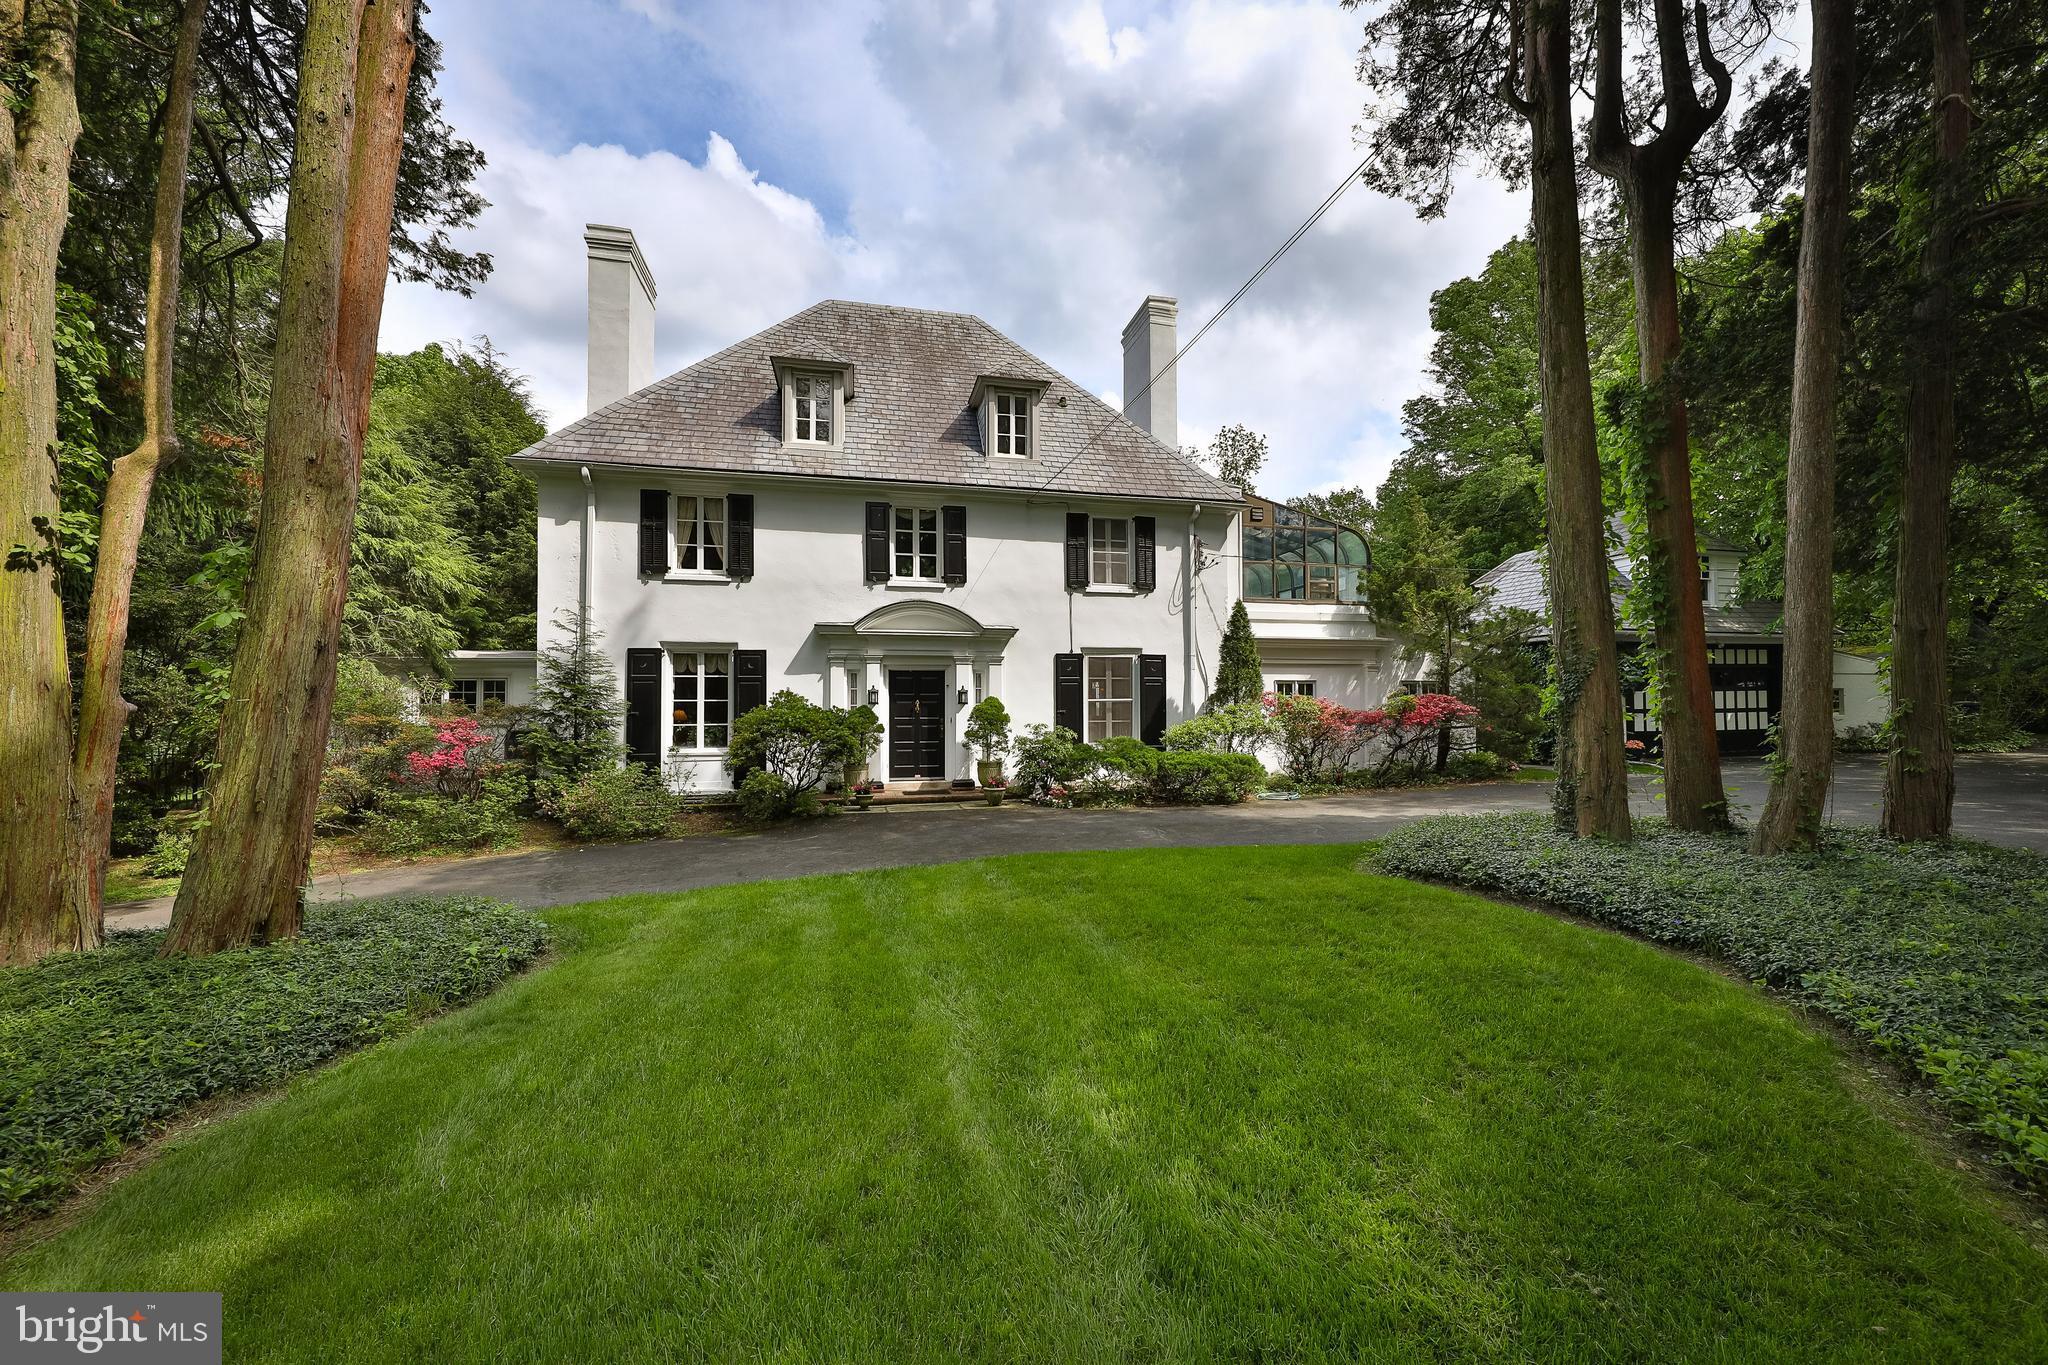 2151 Washington Lane, Huntingdon Valley, PA 19006